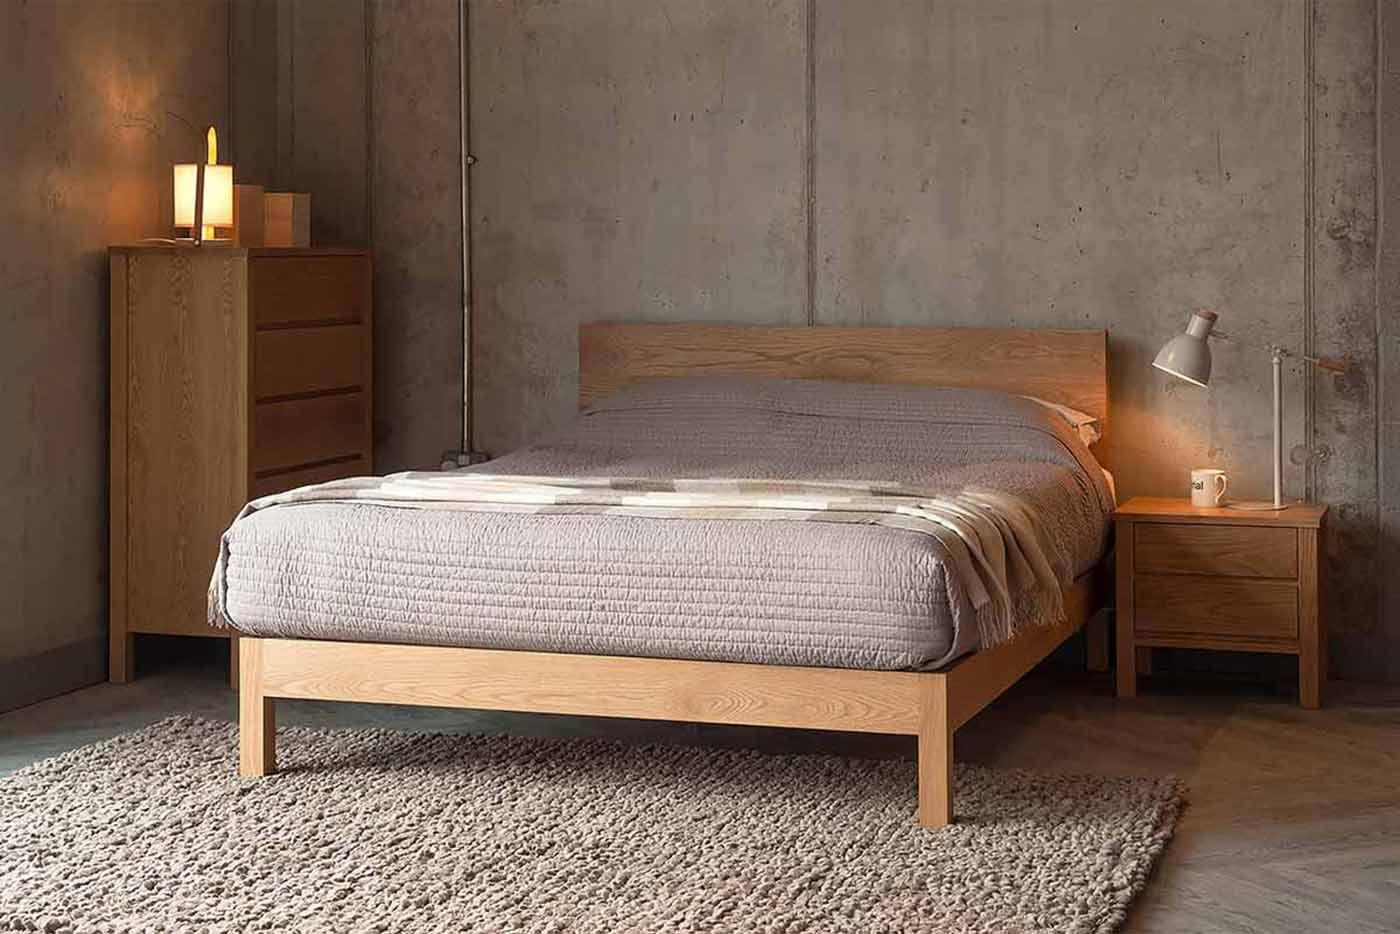 Malabar contemporary wooden bed - handmade in Sheffield